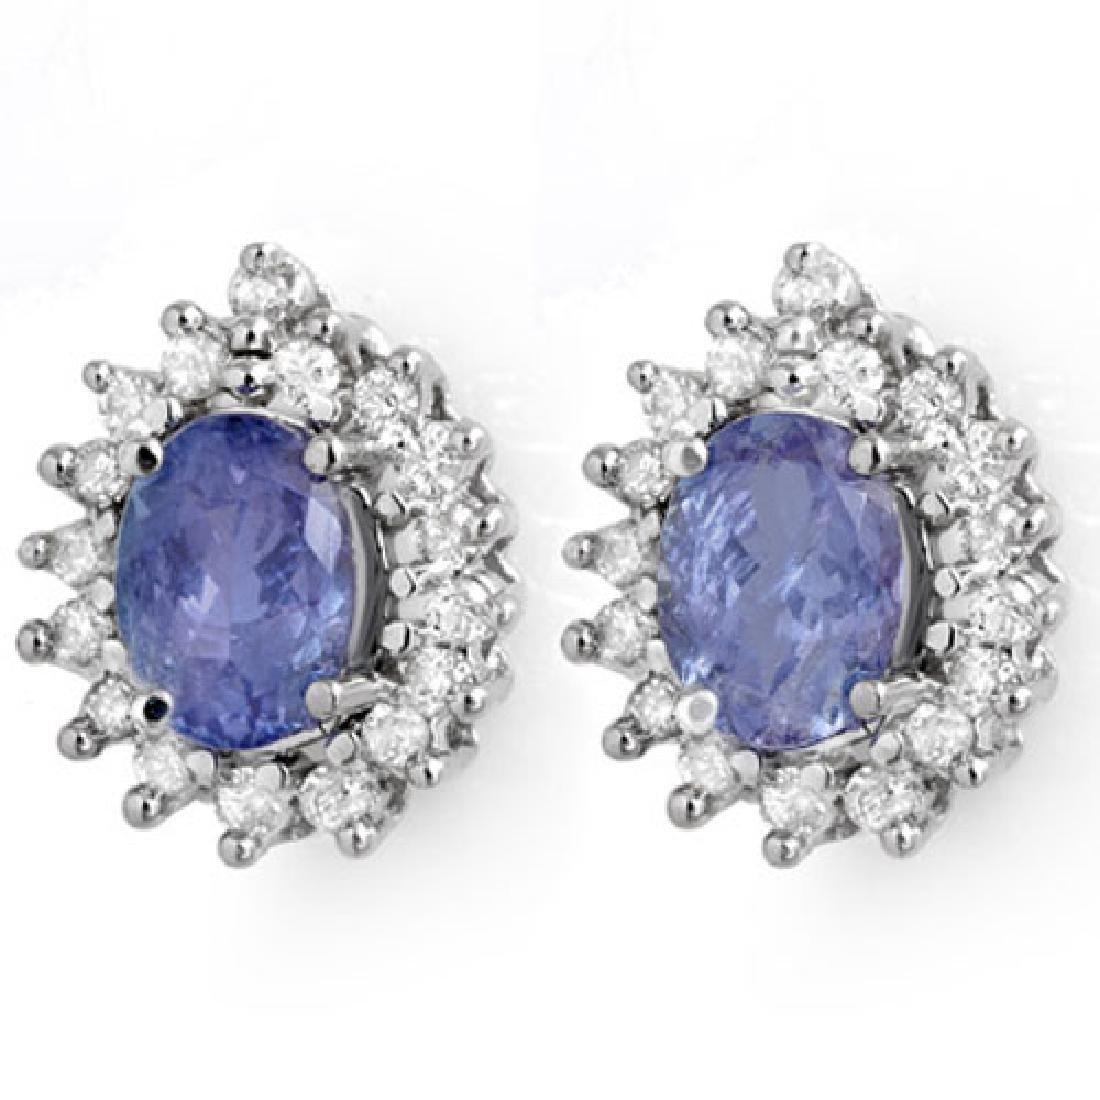 3.63 CTW Tanzanite & Diamond Earrings 14K White Gold